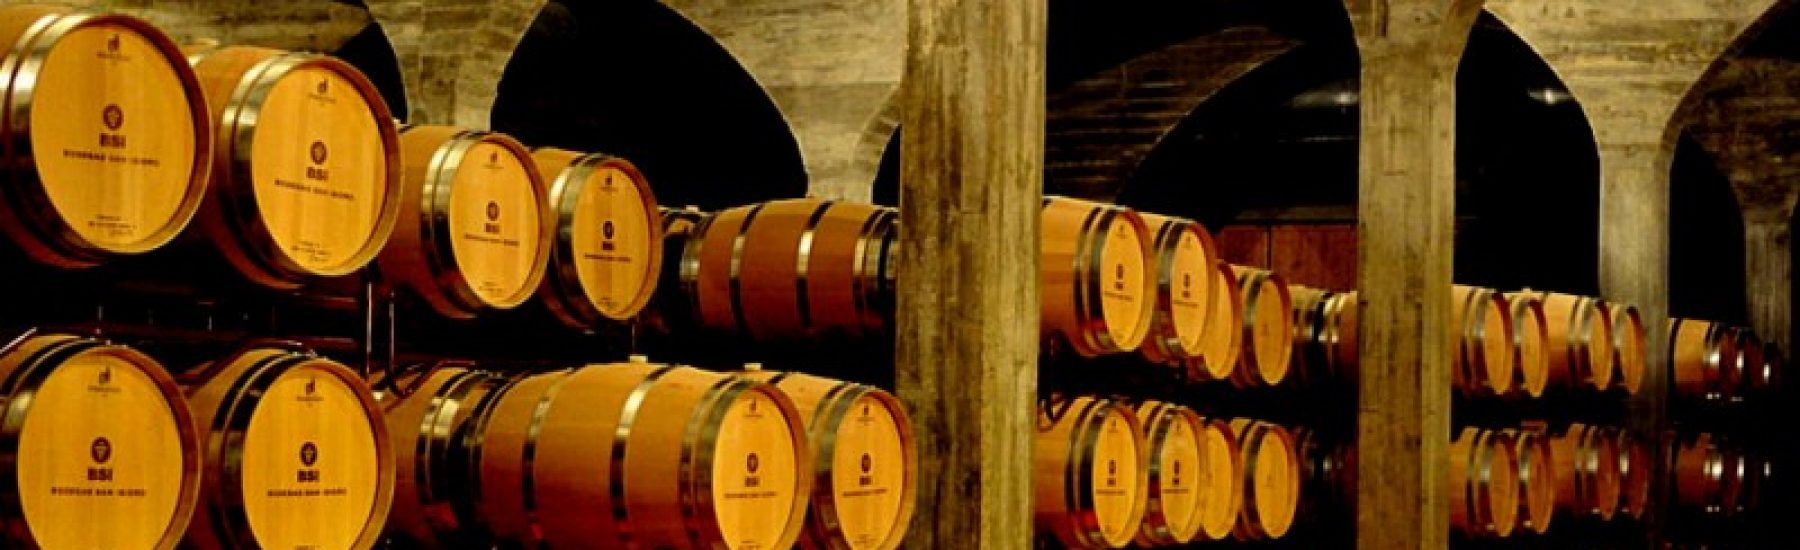 33163_jumilla-wine-route-bodegas-san-isidro_11483729906_large